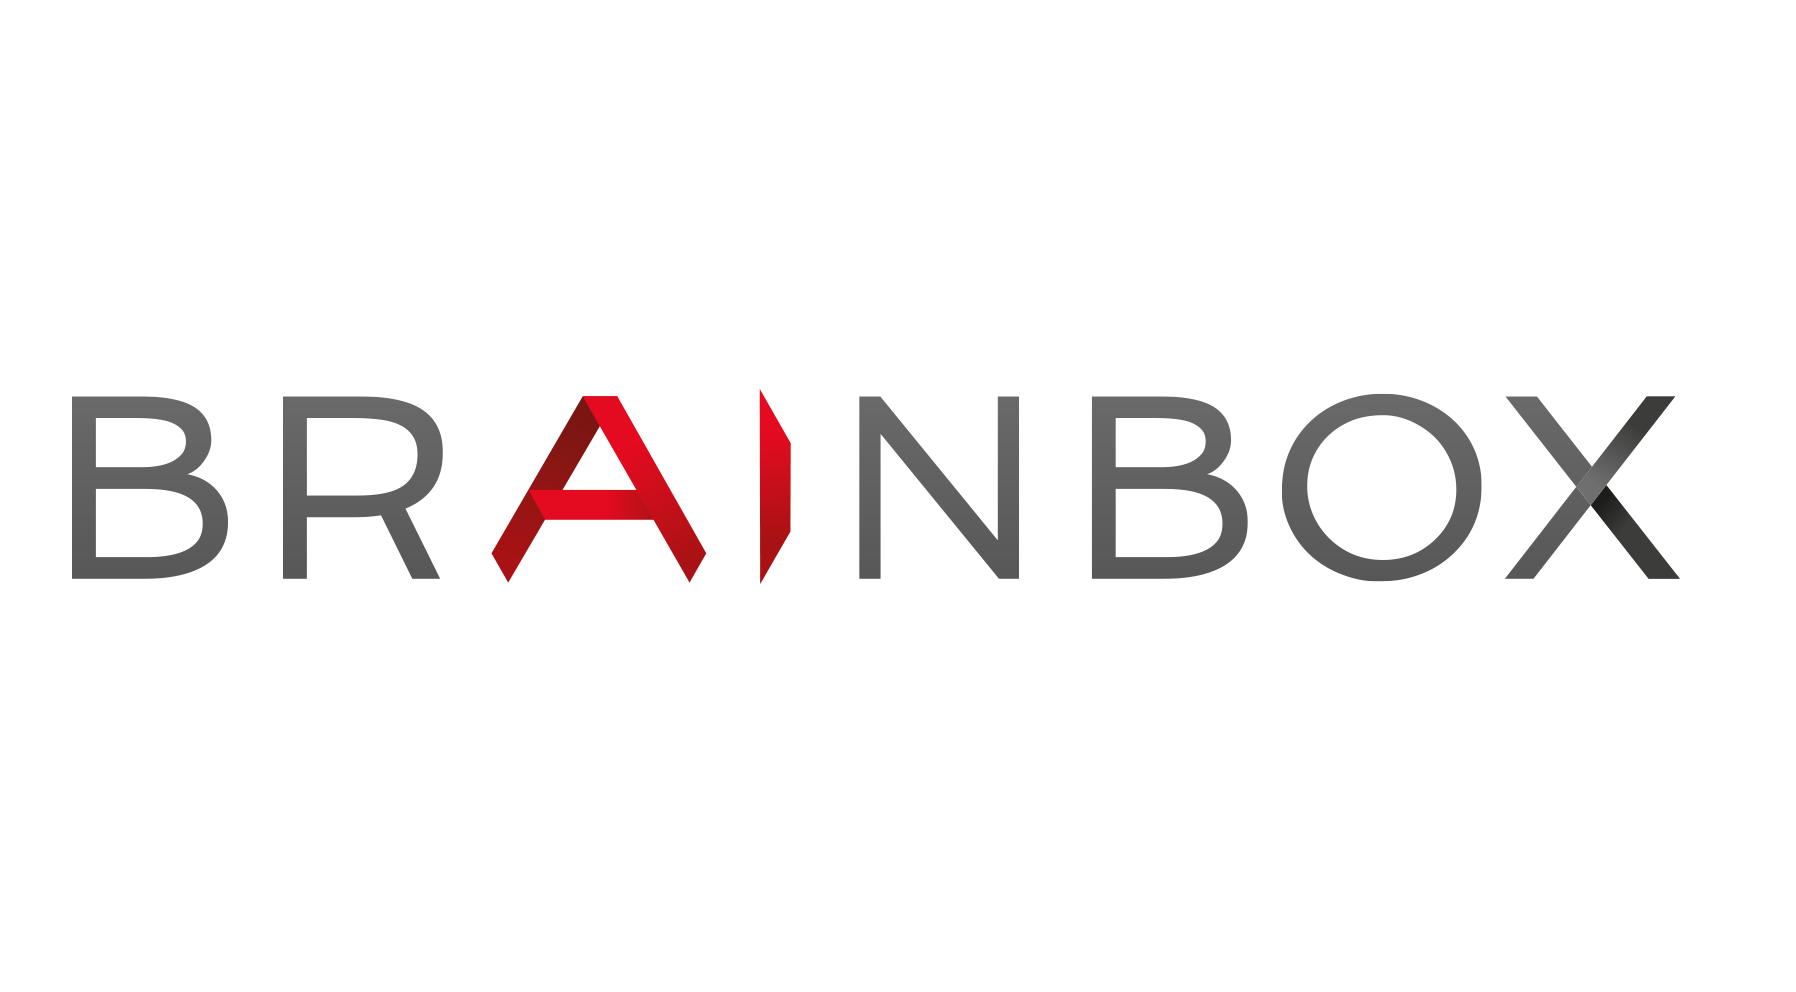 Brainbox-logo_RVB.png